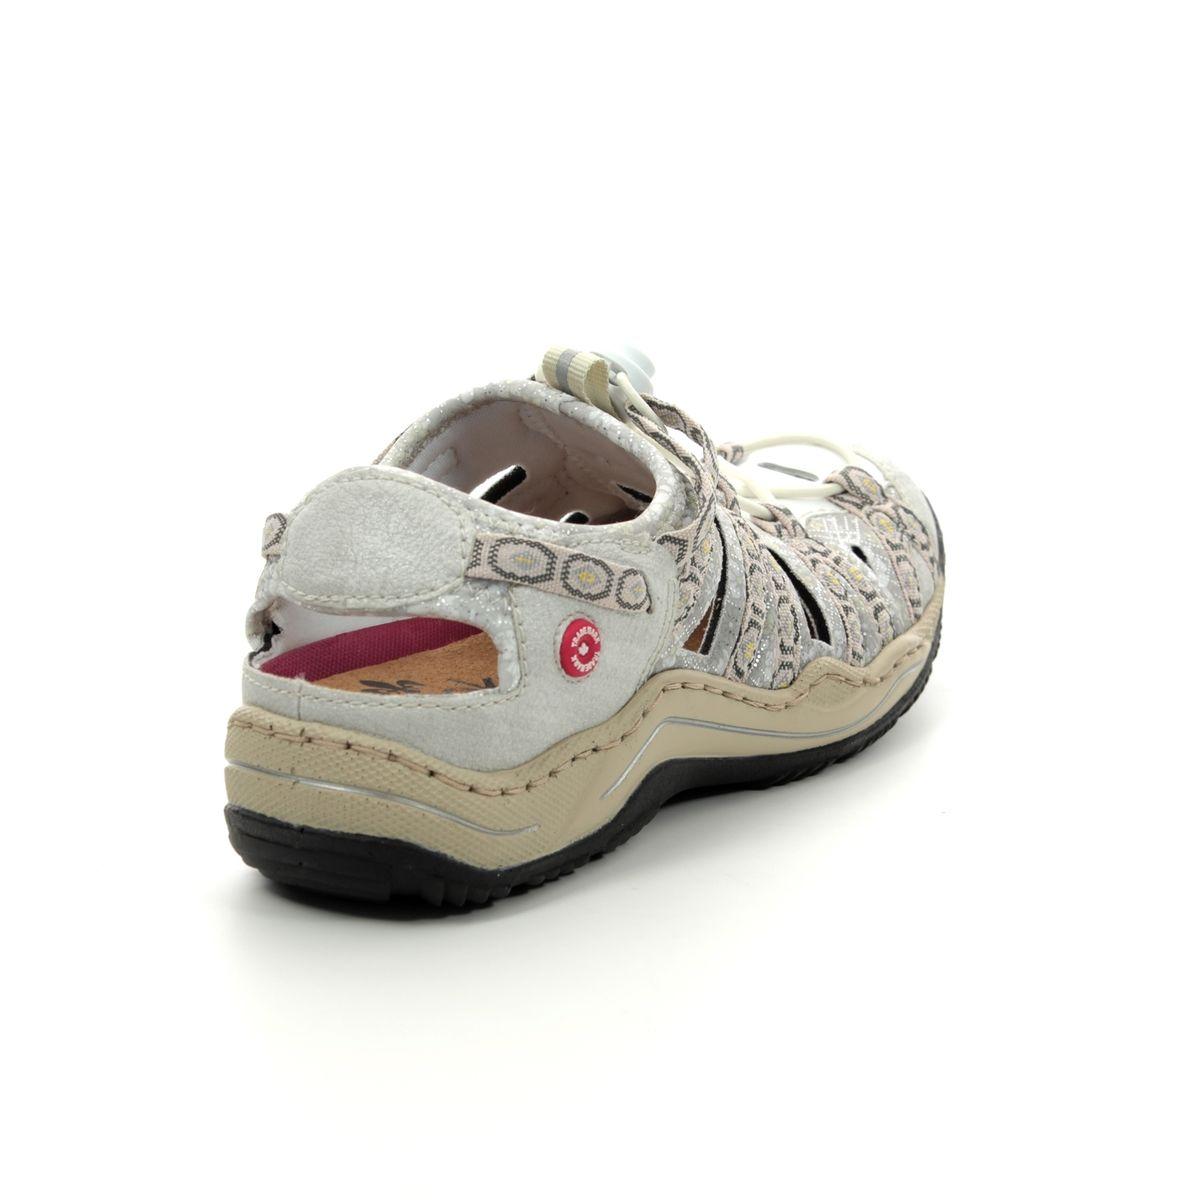 ed2f30be352d Rieker Closed Toe Sandals - Off-white - L0577-80 JEERSY